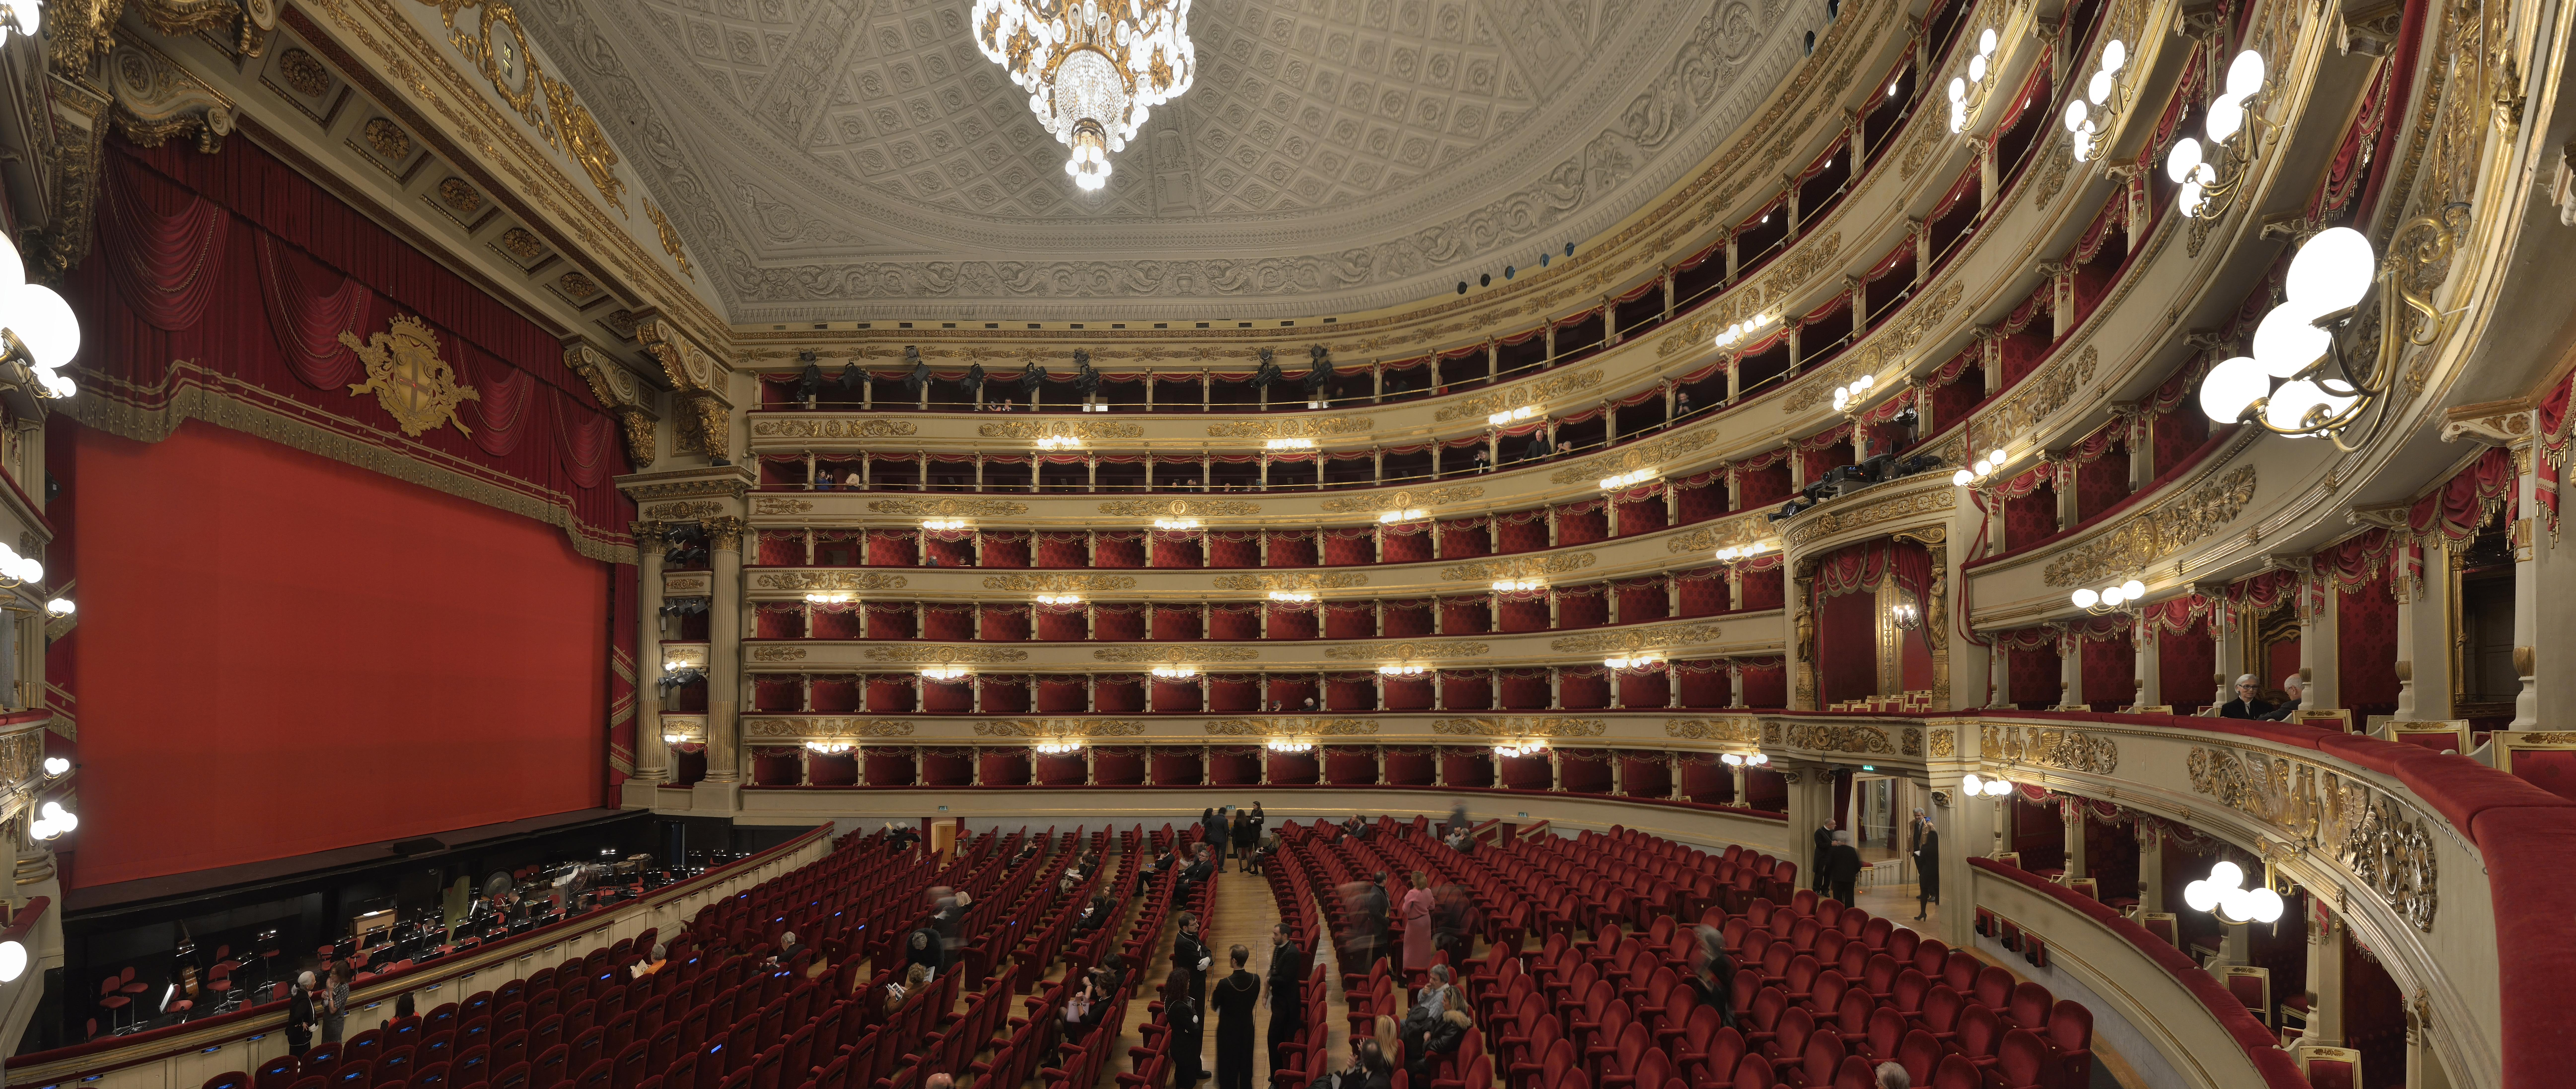 Teatro_alla_Scala_interior_Milan